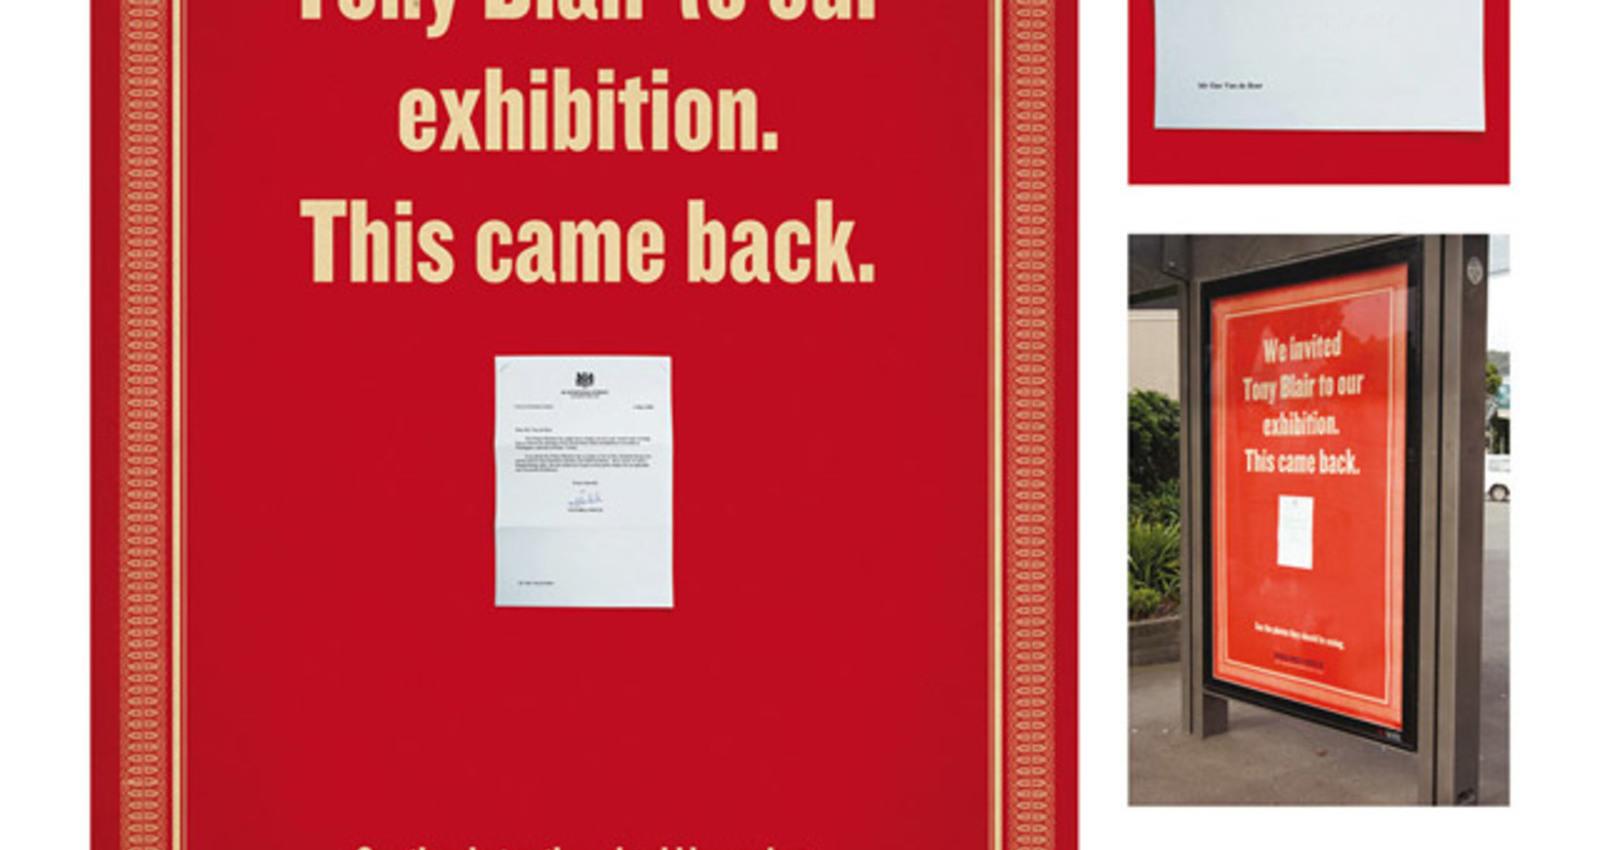 World Press Photo Exhibition 2006